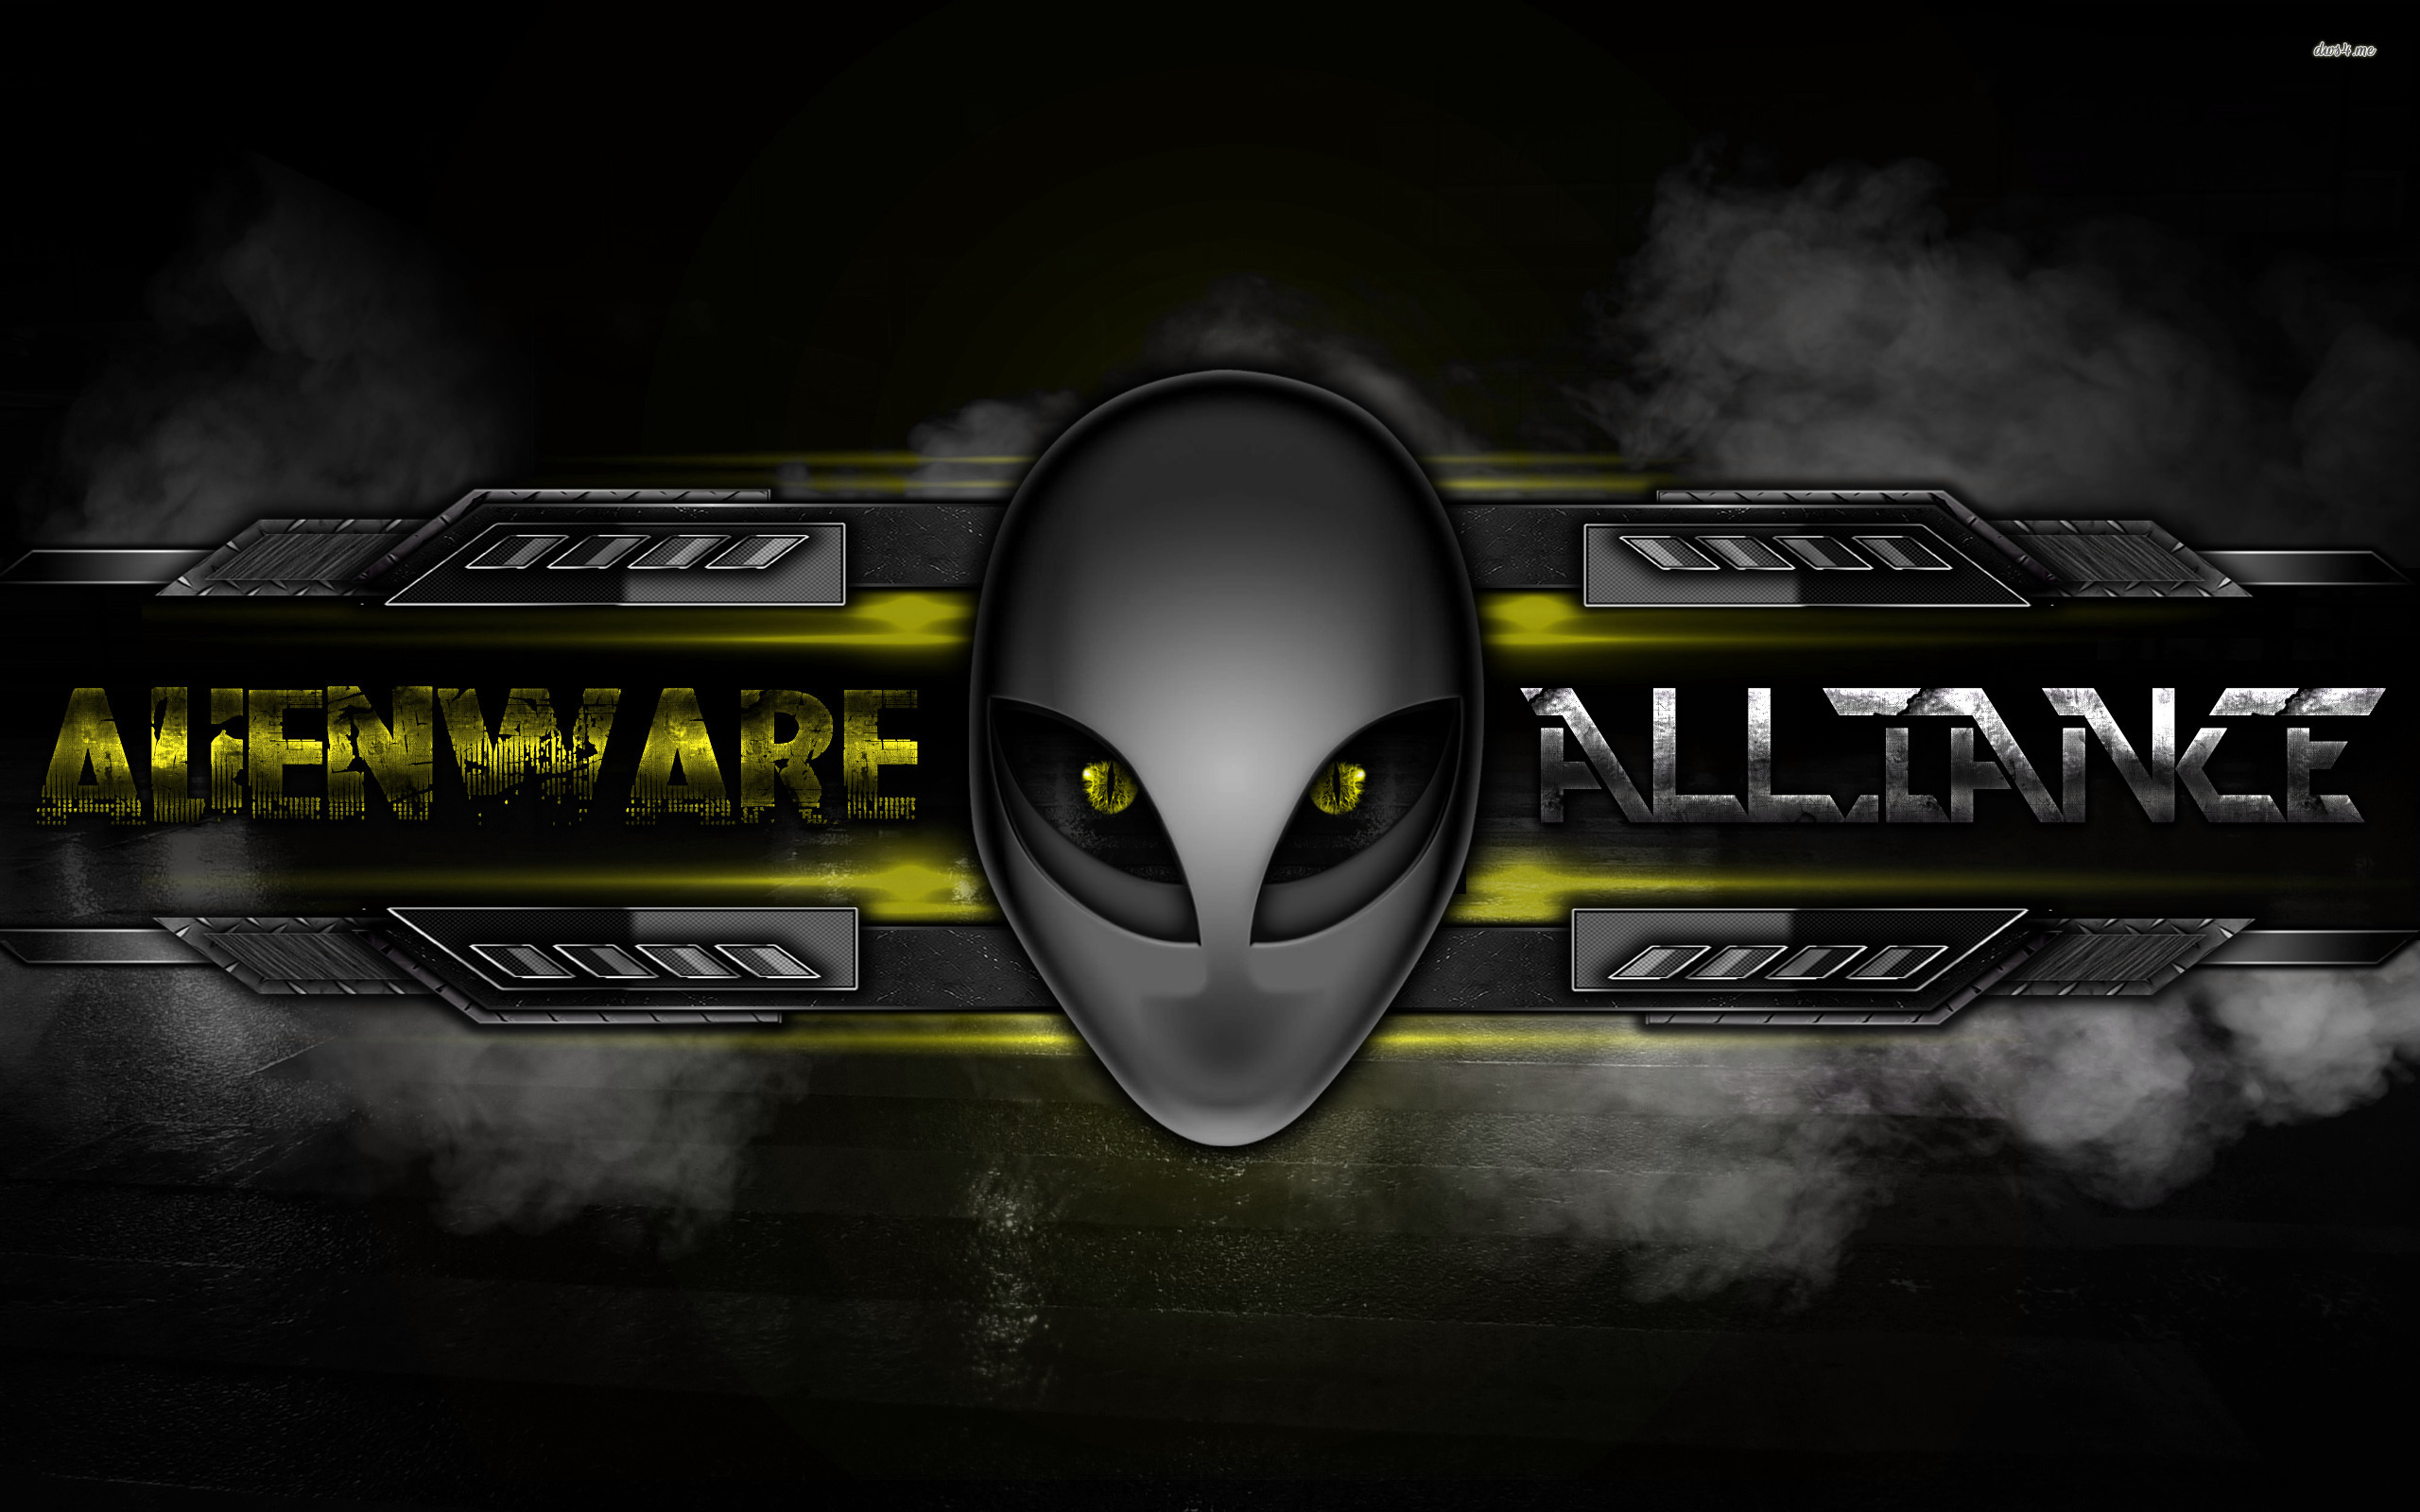 47 4k Alienware Wallpaper On Wallpapersafari